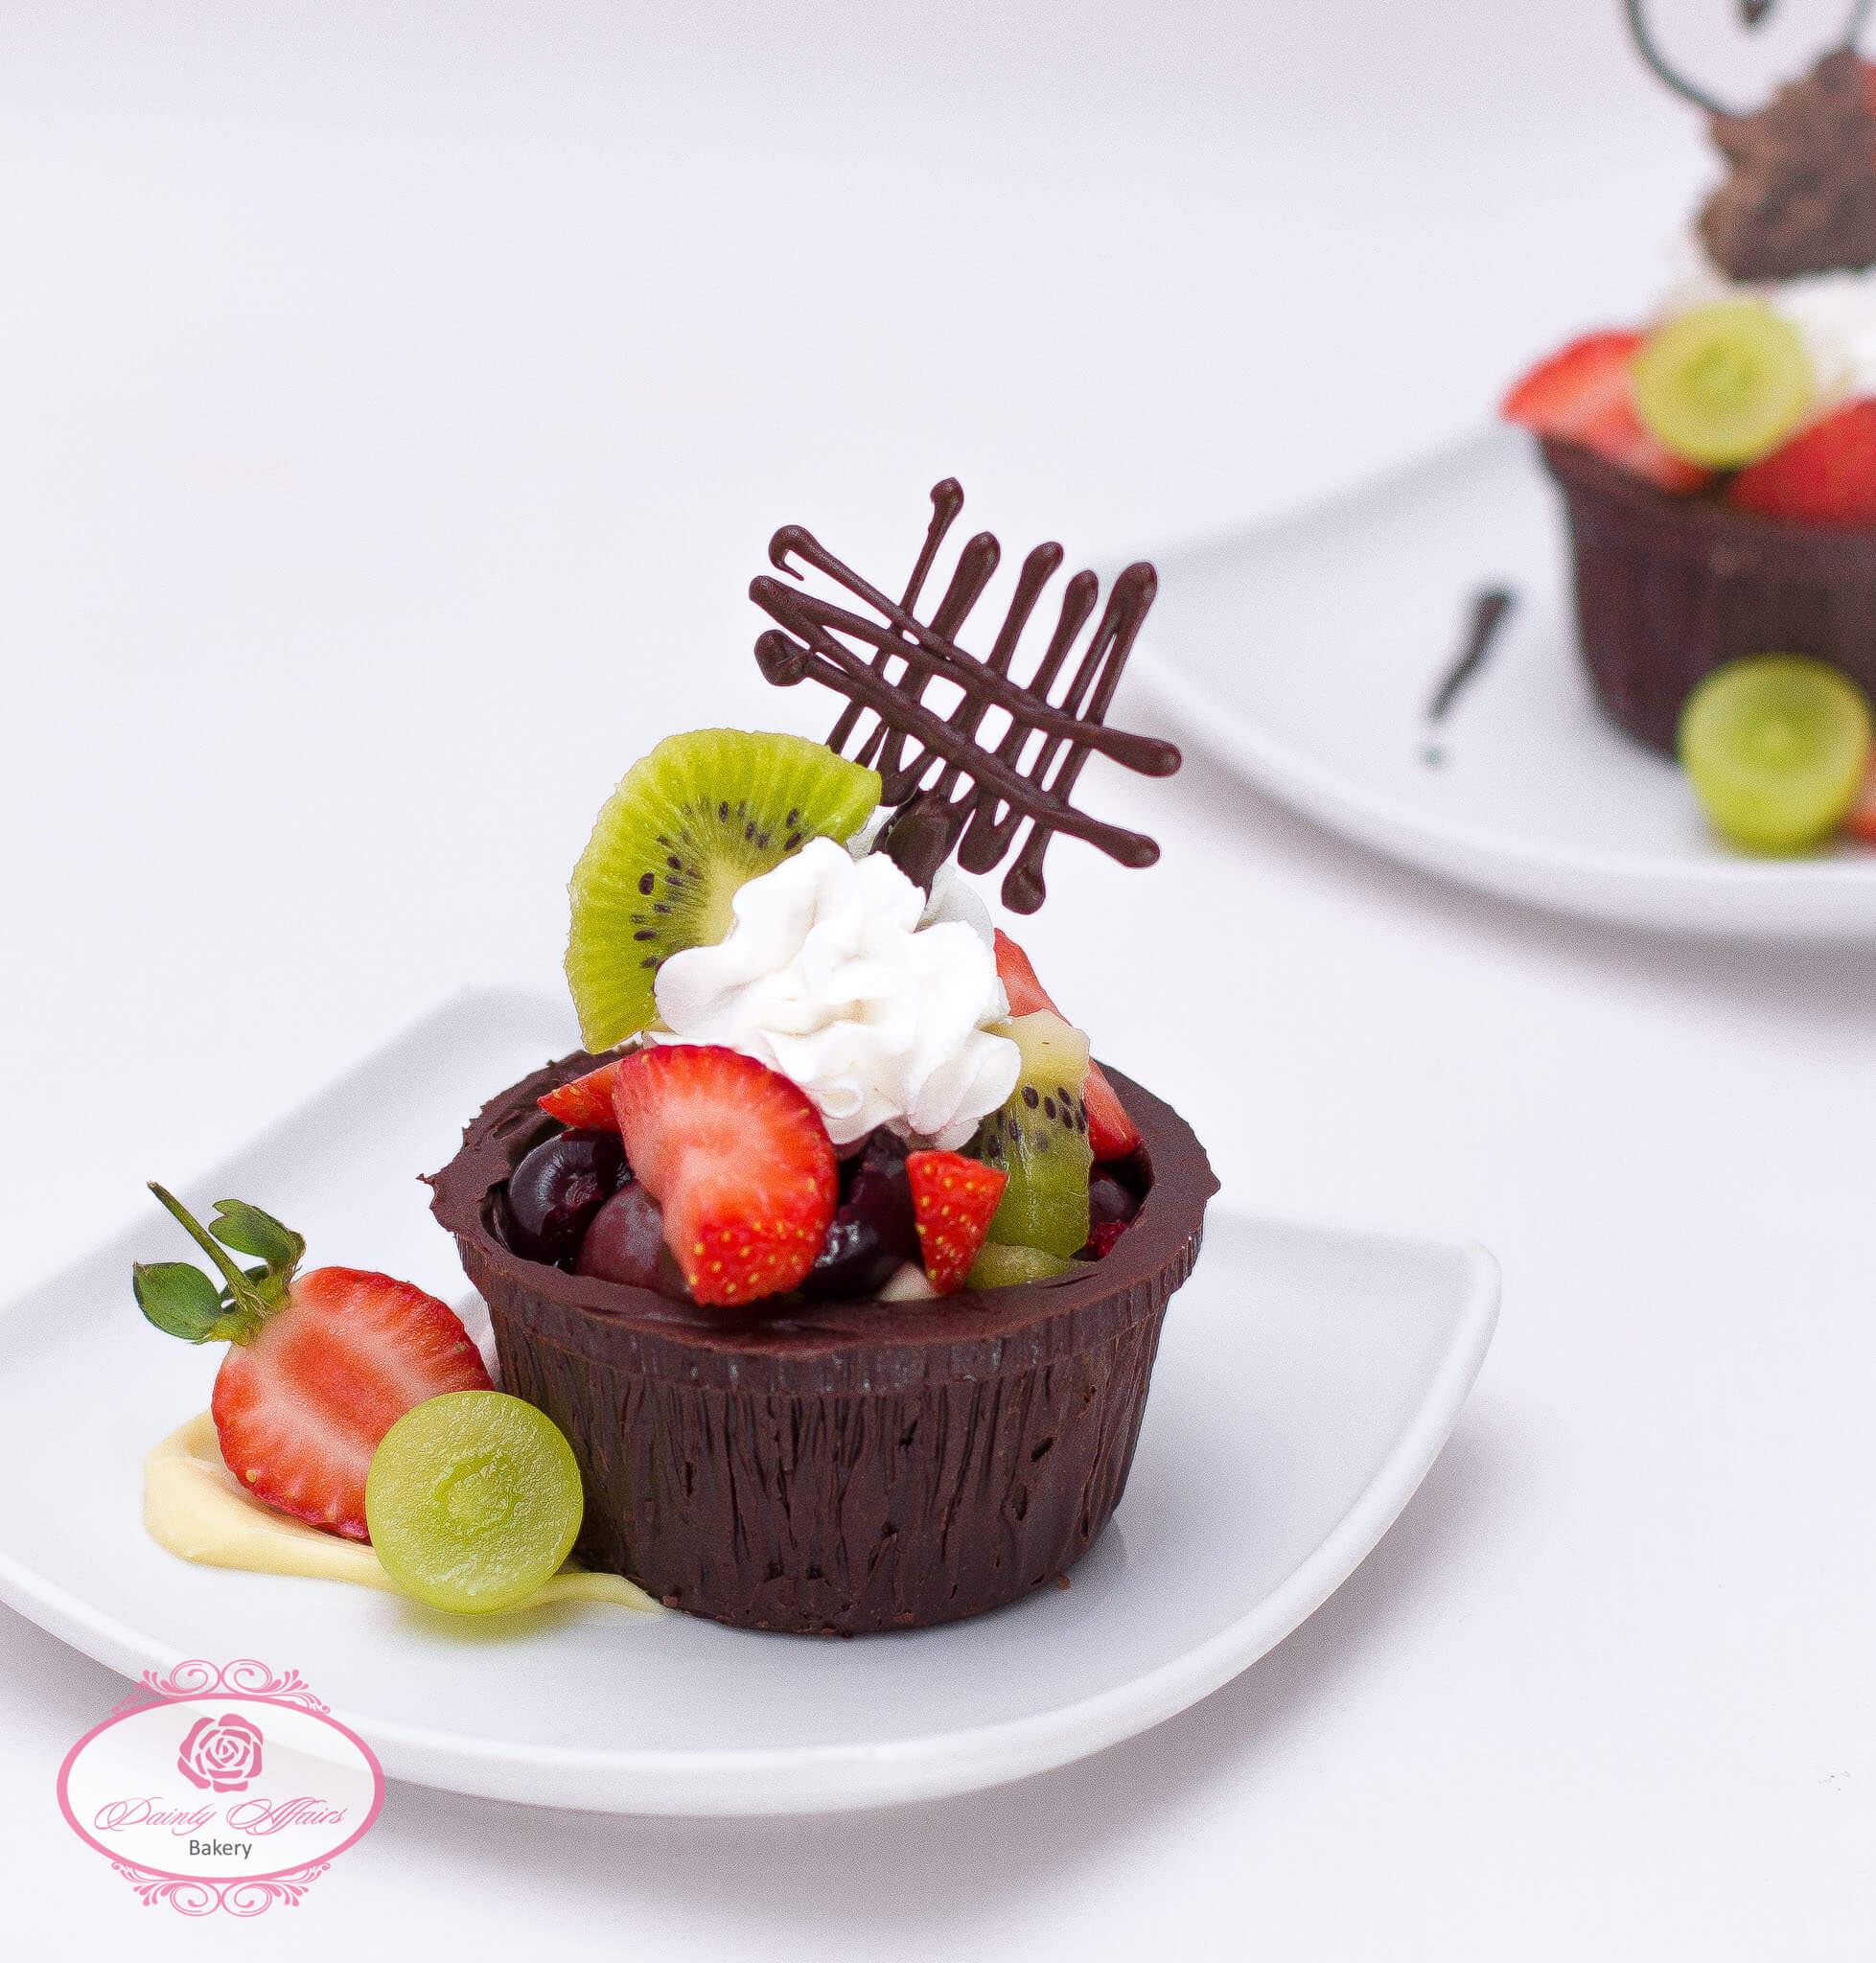 Bridal shower cake – Dainty Affairs Bakery | Cakes | Cupcakes ...